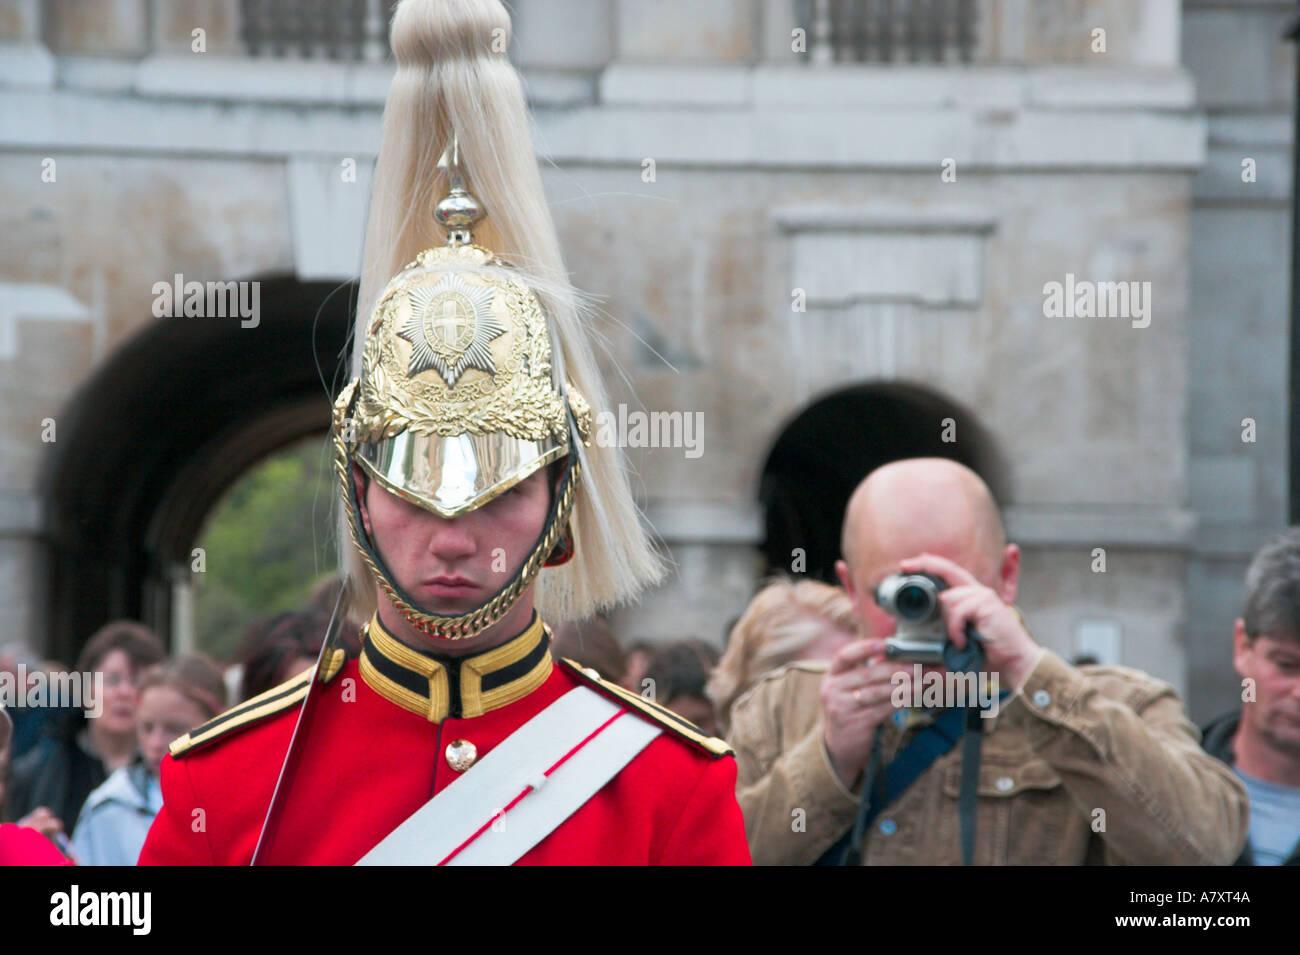 Queens Royal Life Guard Horse Guard Horseguard LifeGuard in London England UK - Stock Image